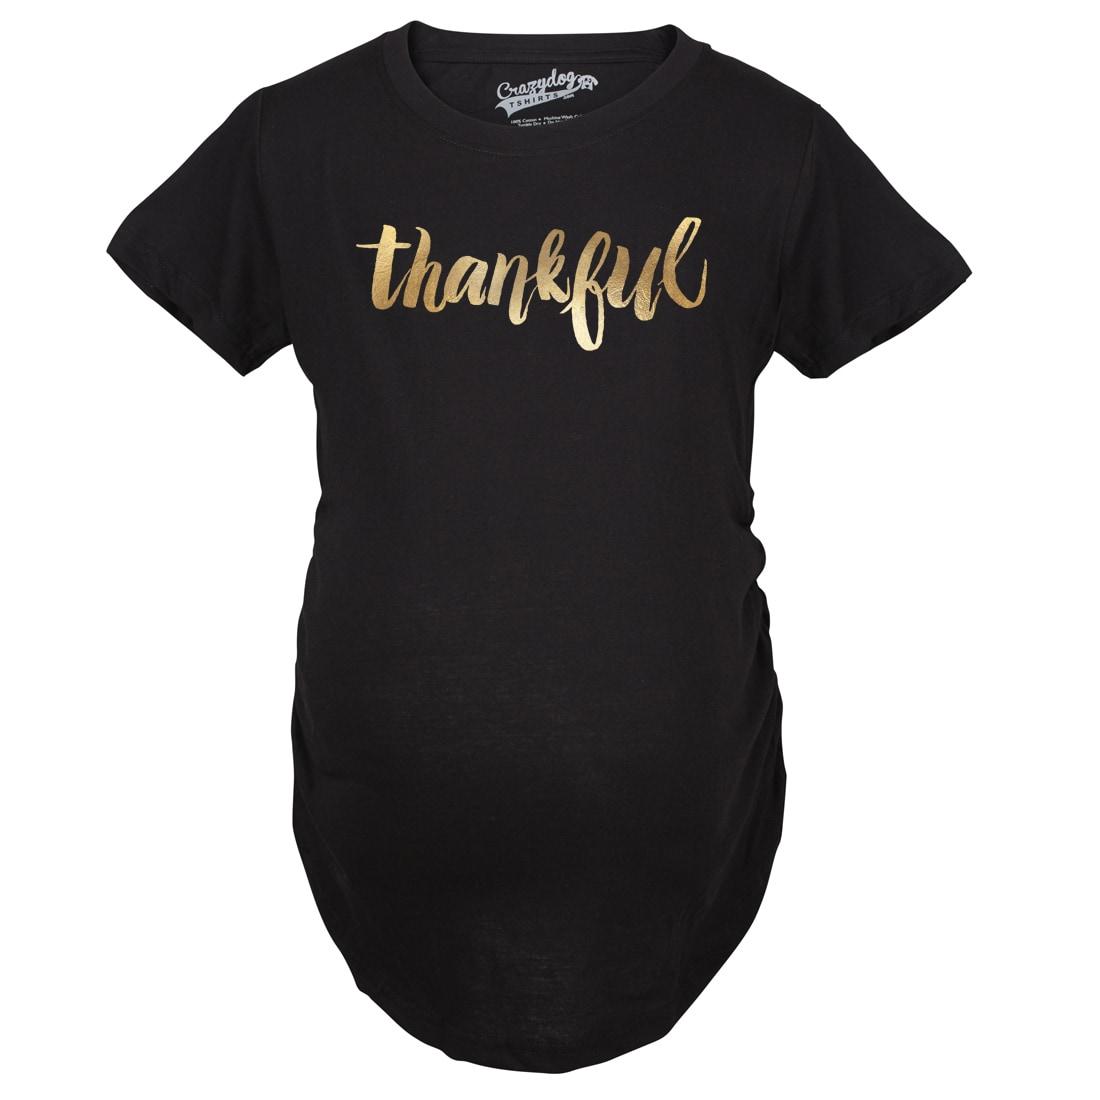 Crazy Dog Maternity Thankful Script Gold Shimmer Pregnanc...